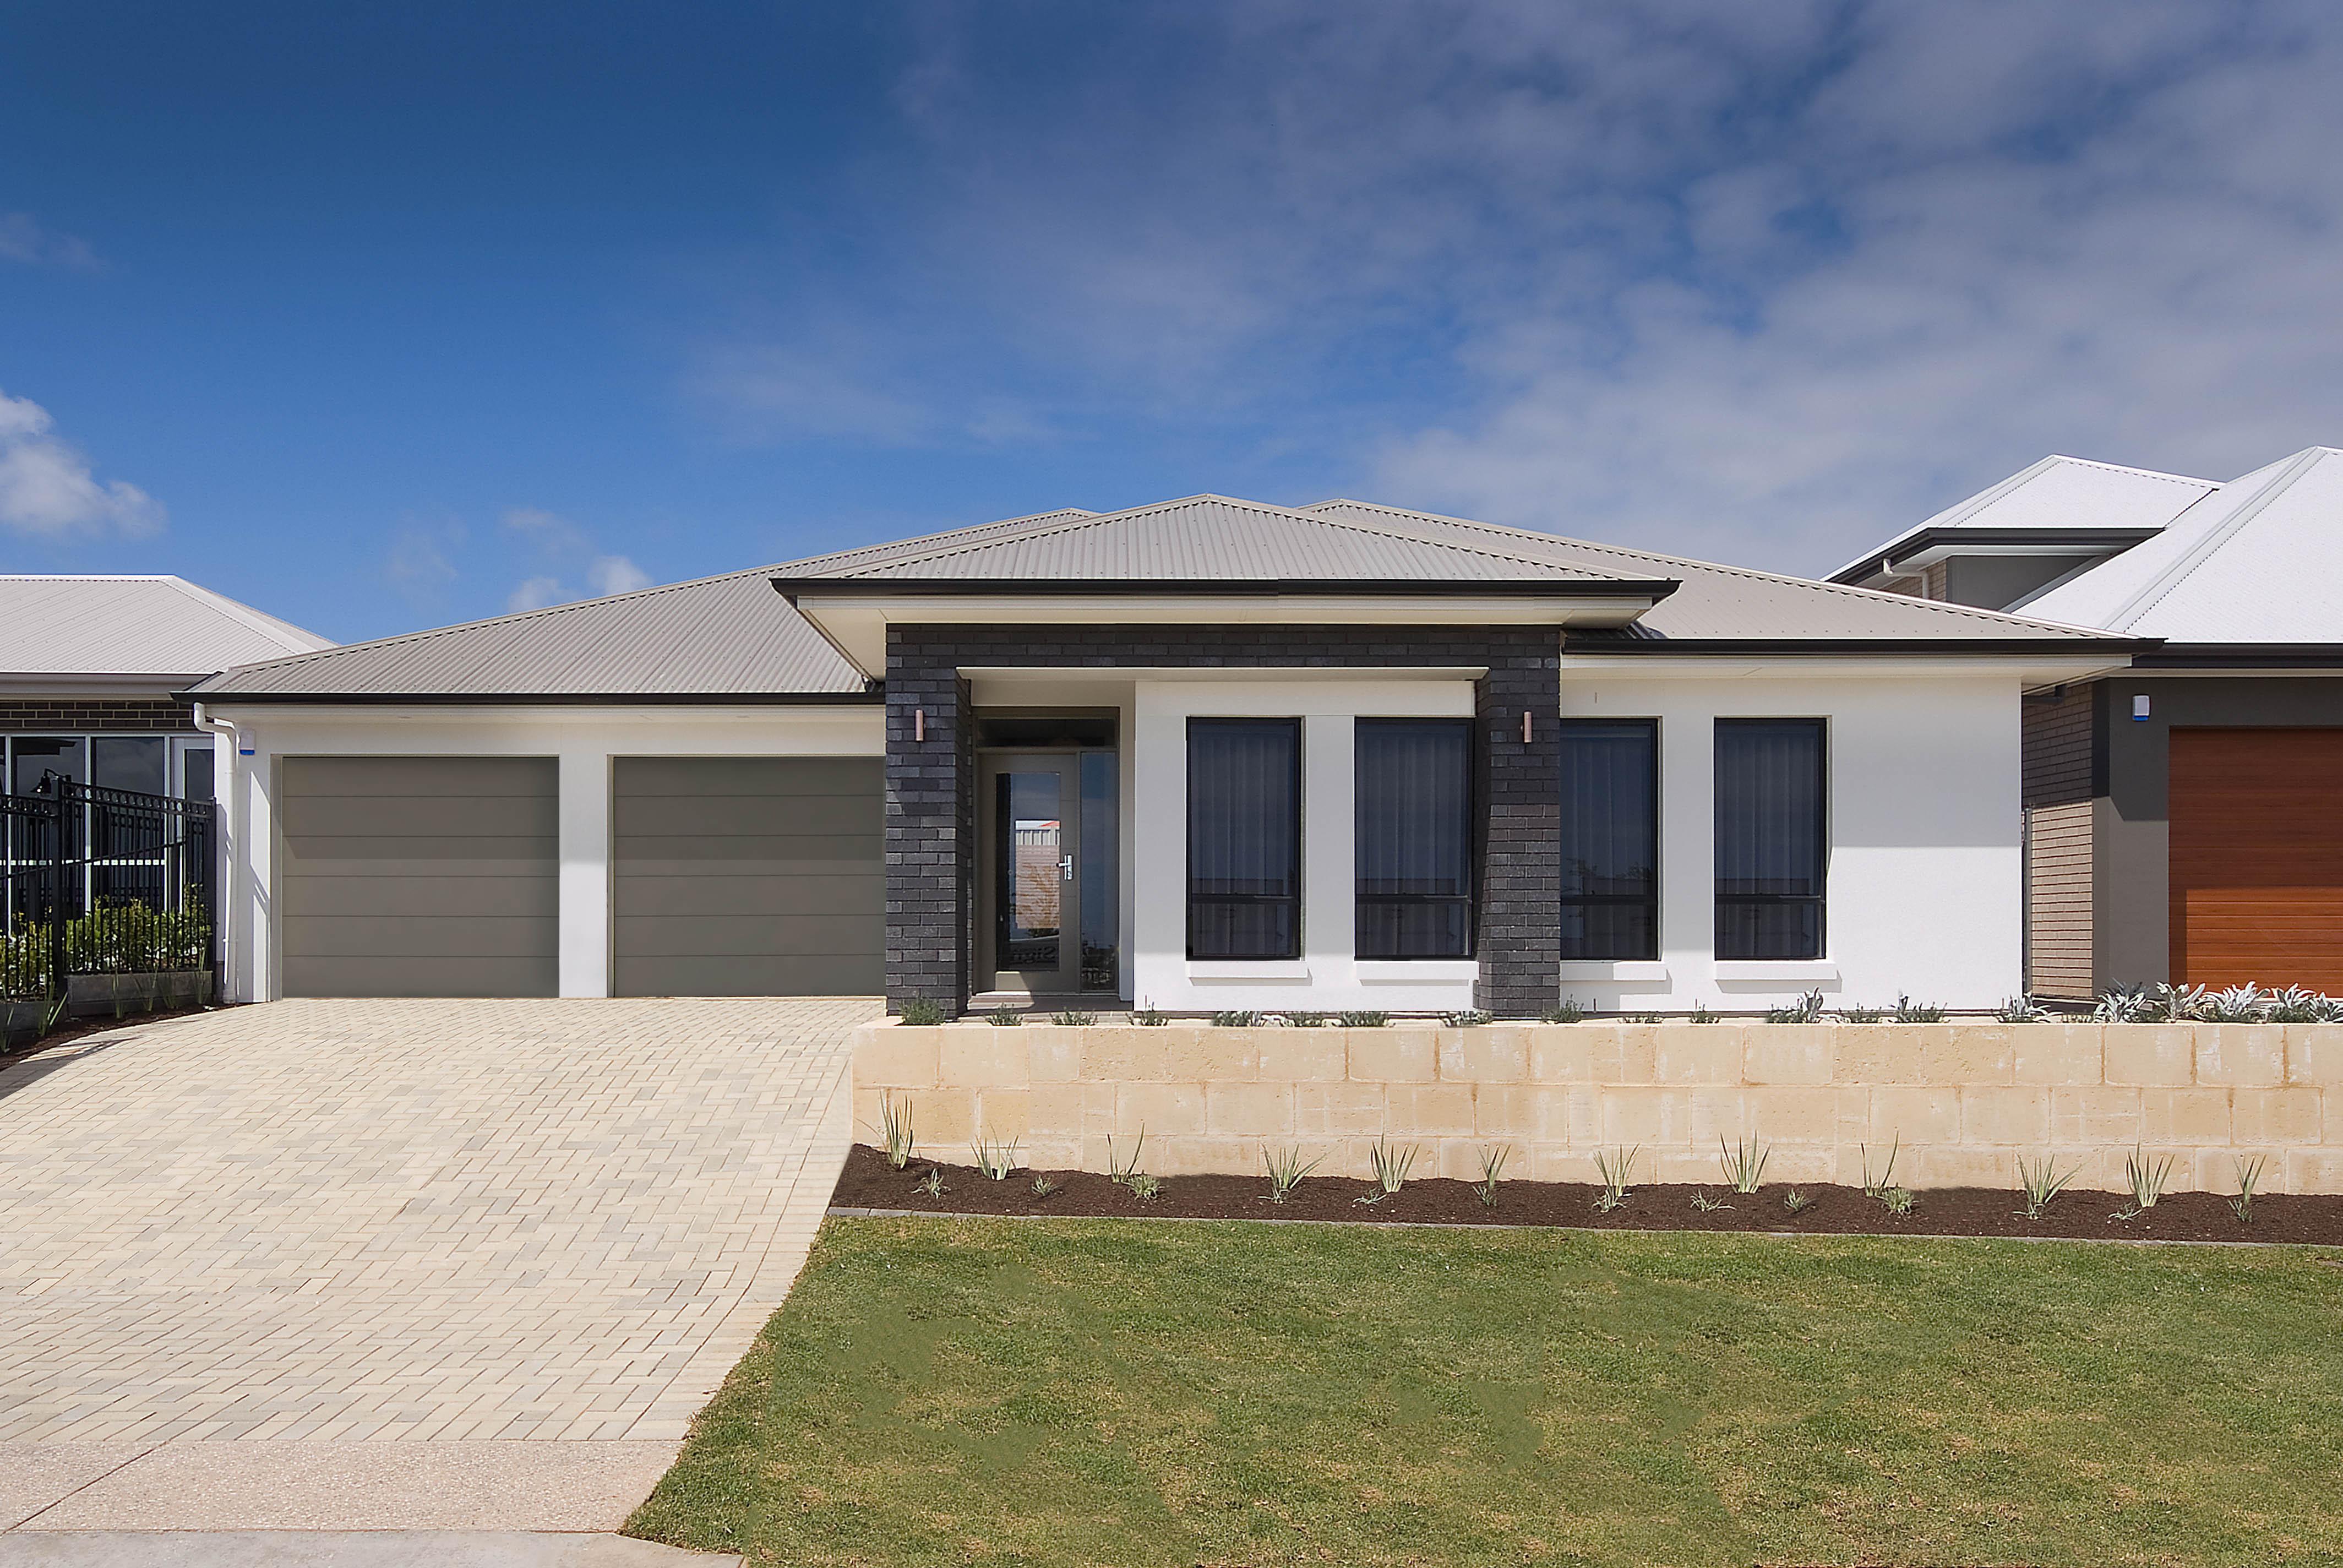 Garage homes australia house plan 2017 for Beach house designs adelaide